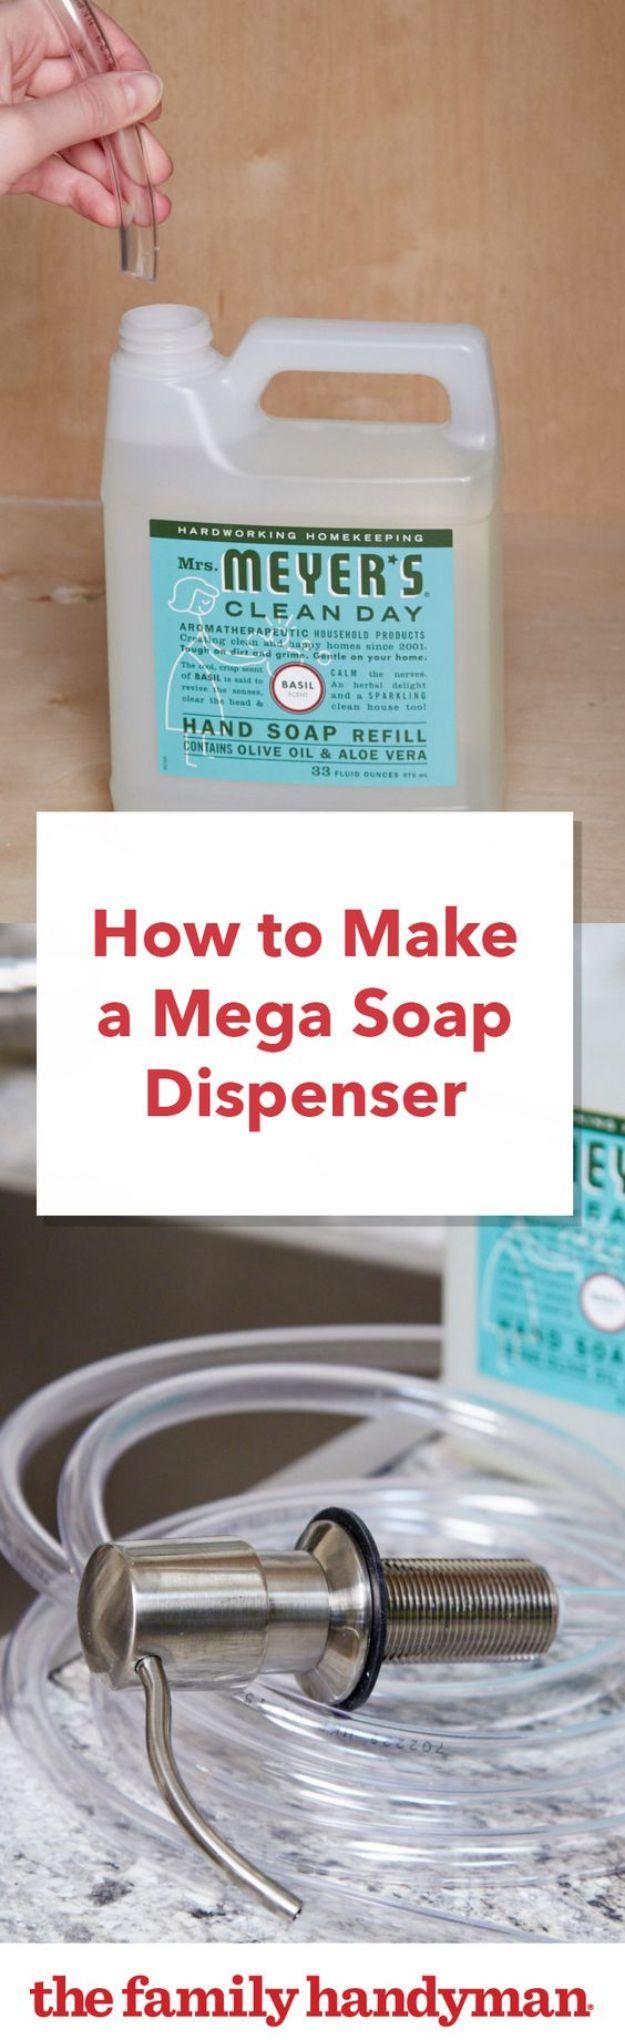 DIY Soap Dispensers - Make a Mega Soap Dispenser - Easy Soap Dispenser Ideas to Make for Kitchen, Bathroom - Mason Jar Idea, Cute Crafts to Make and Sell, Kids Bath Decor